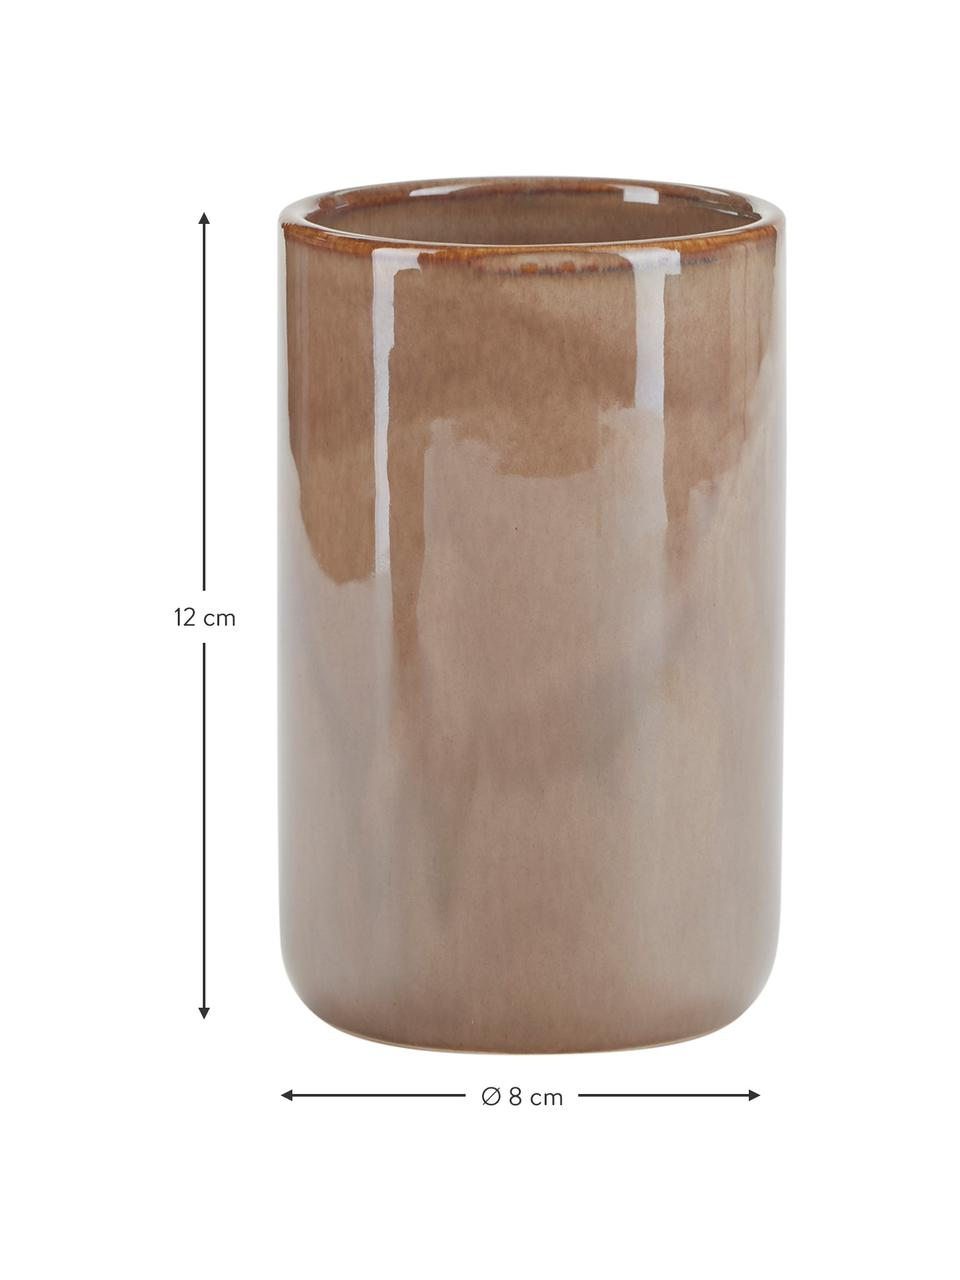 Zahnputzbecher Tin aus Keramik in Braun, Keramik, Braun, Ø 8 x H 12 cm